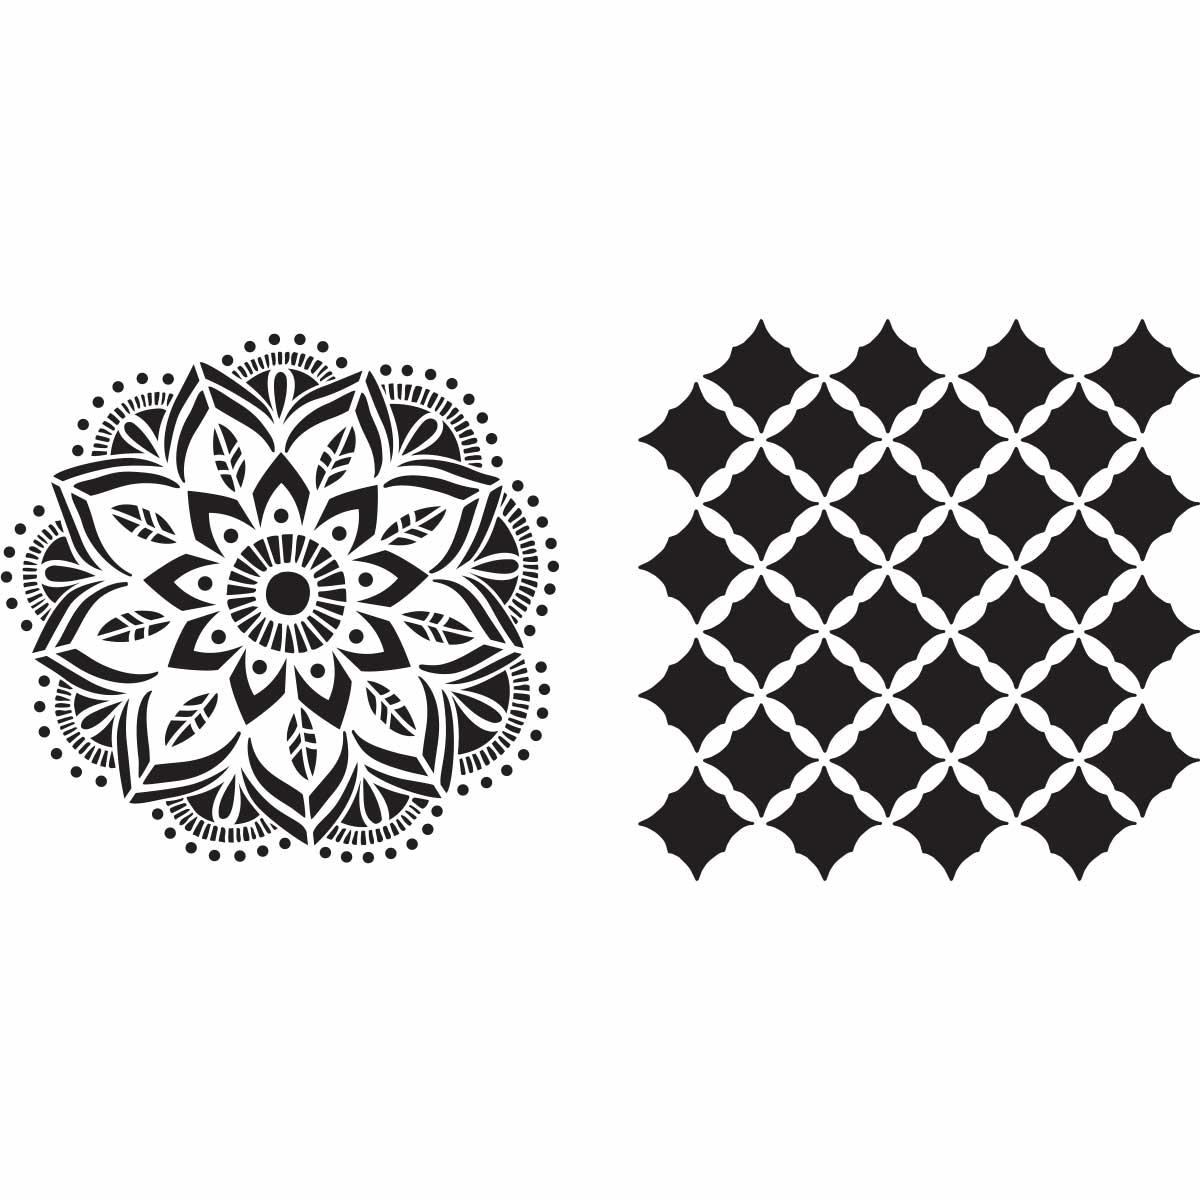 Fabric Creations™ Adhesive Stencils - Mandala, 6